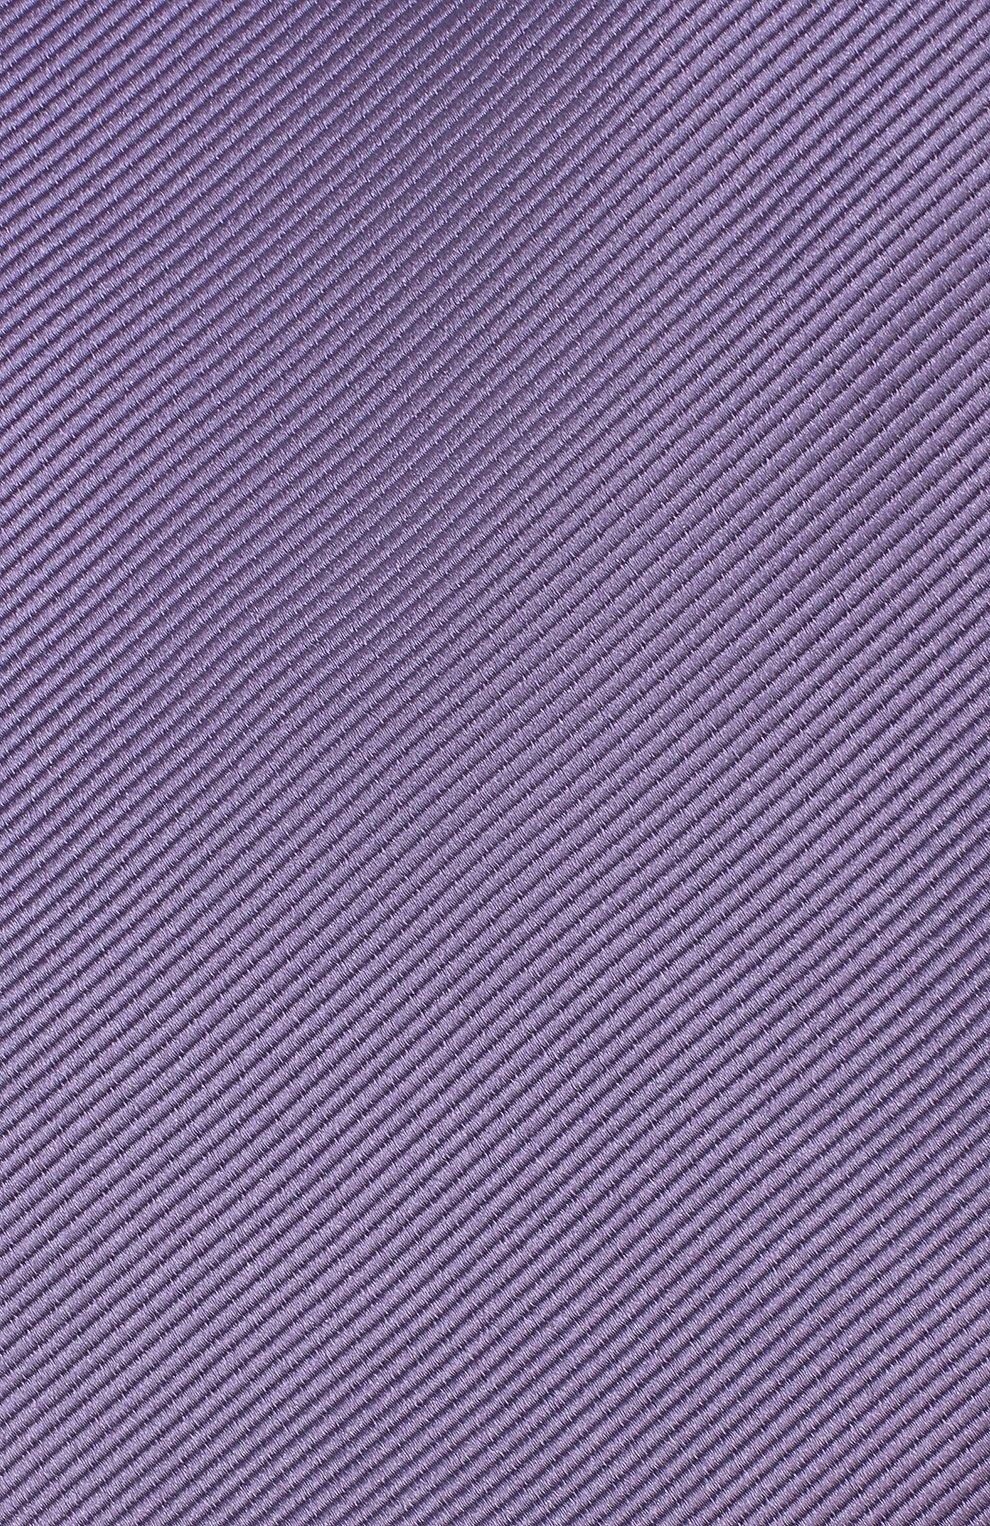 Мужской шелковый галстук TOM FORD сиреневого цвета, арт. 3TF08/XTF   Фото 3